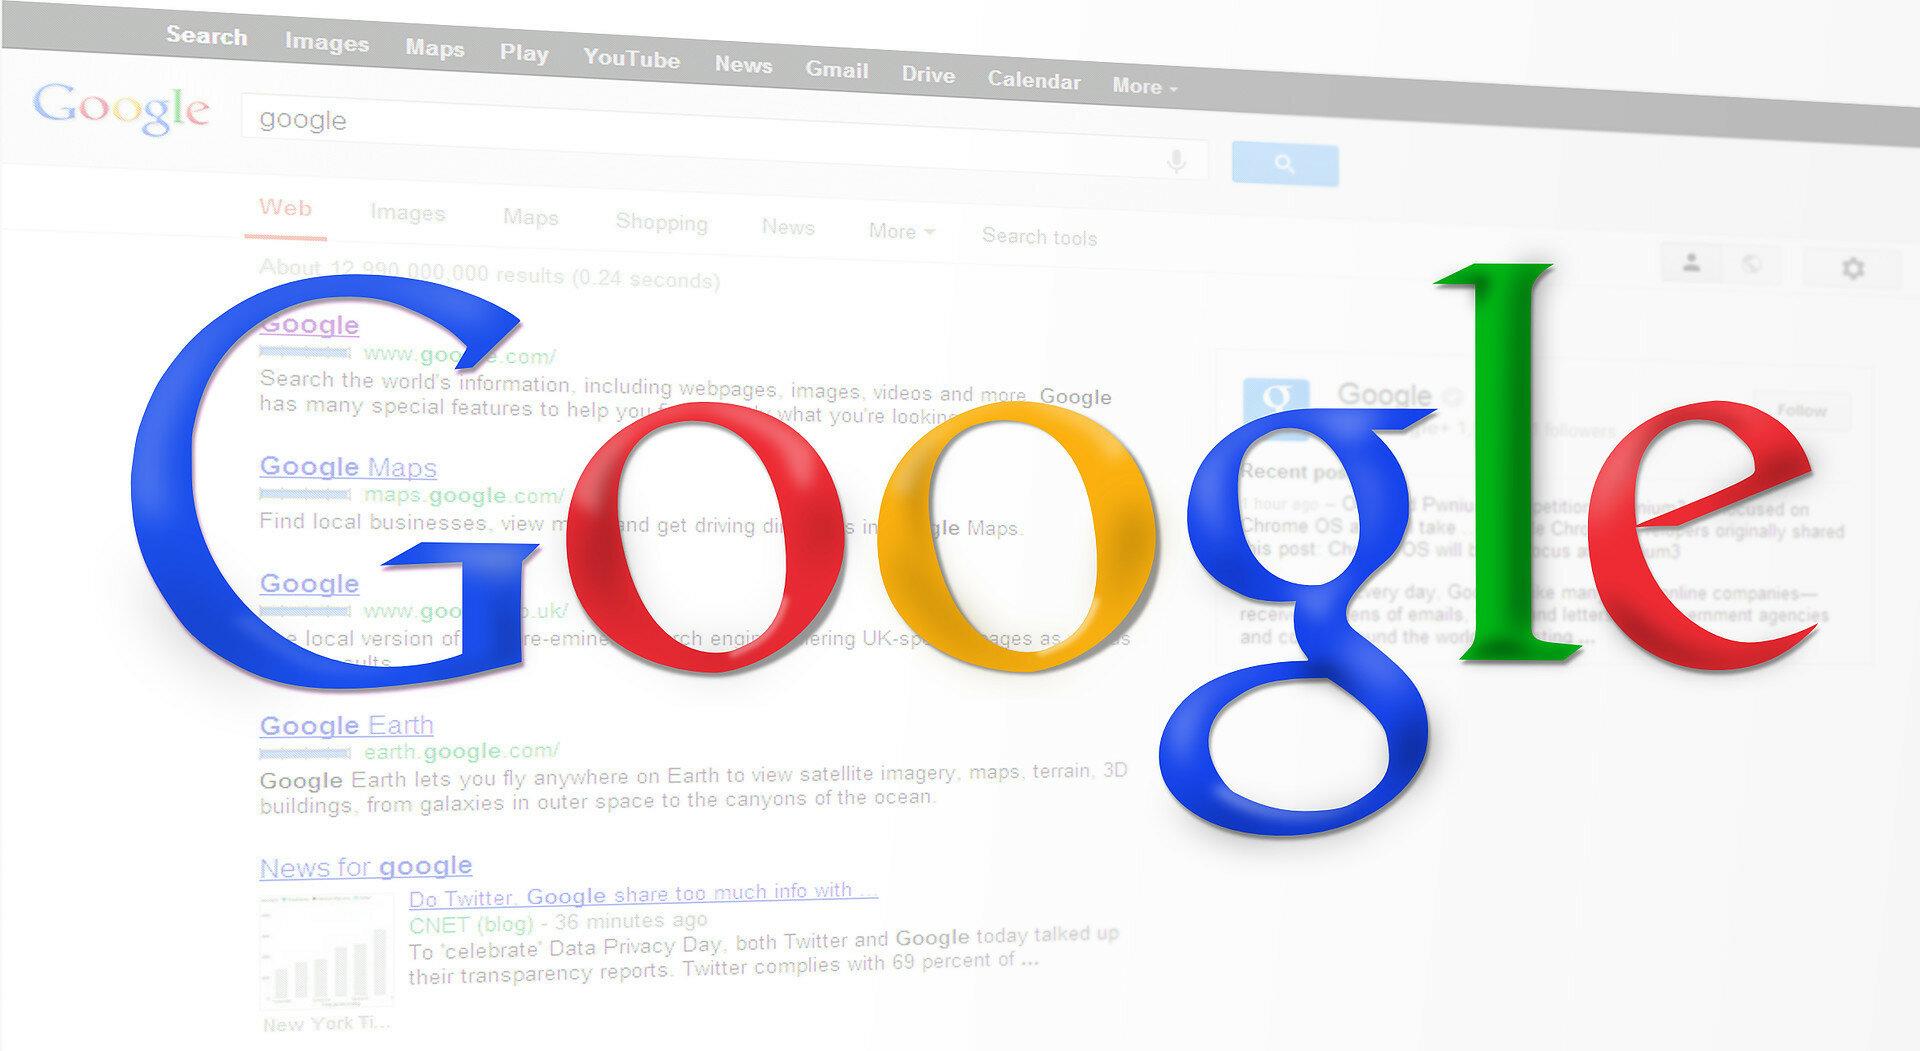 Налог на Google: Гетманцев разъяснил нюансы законопроекта